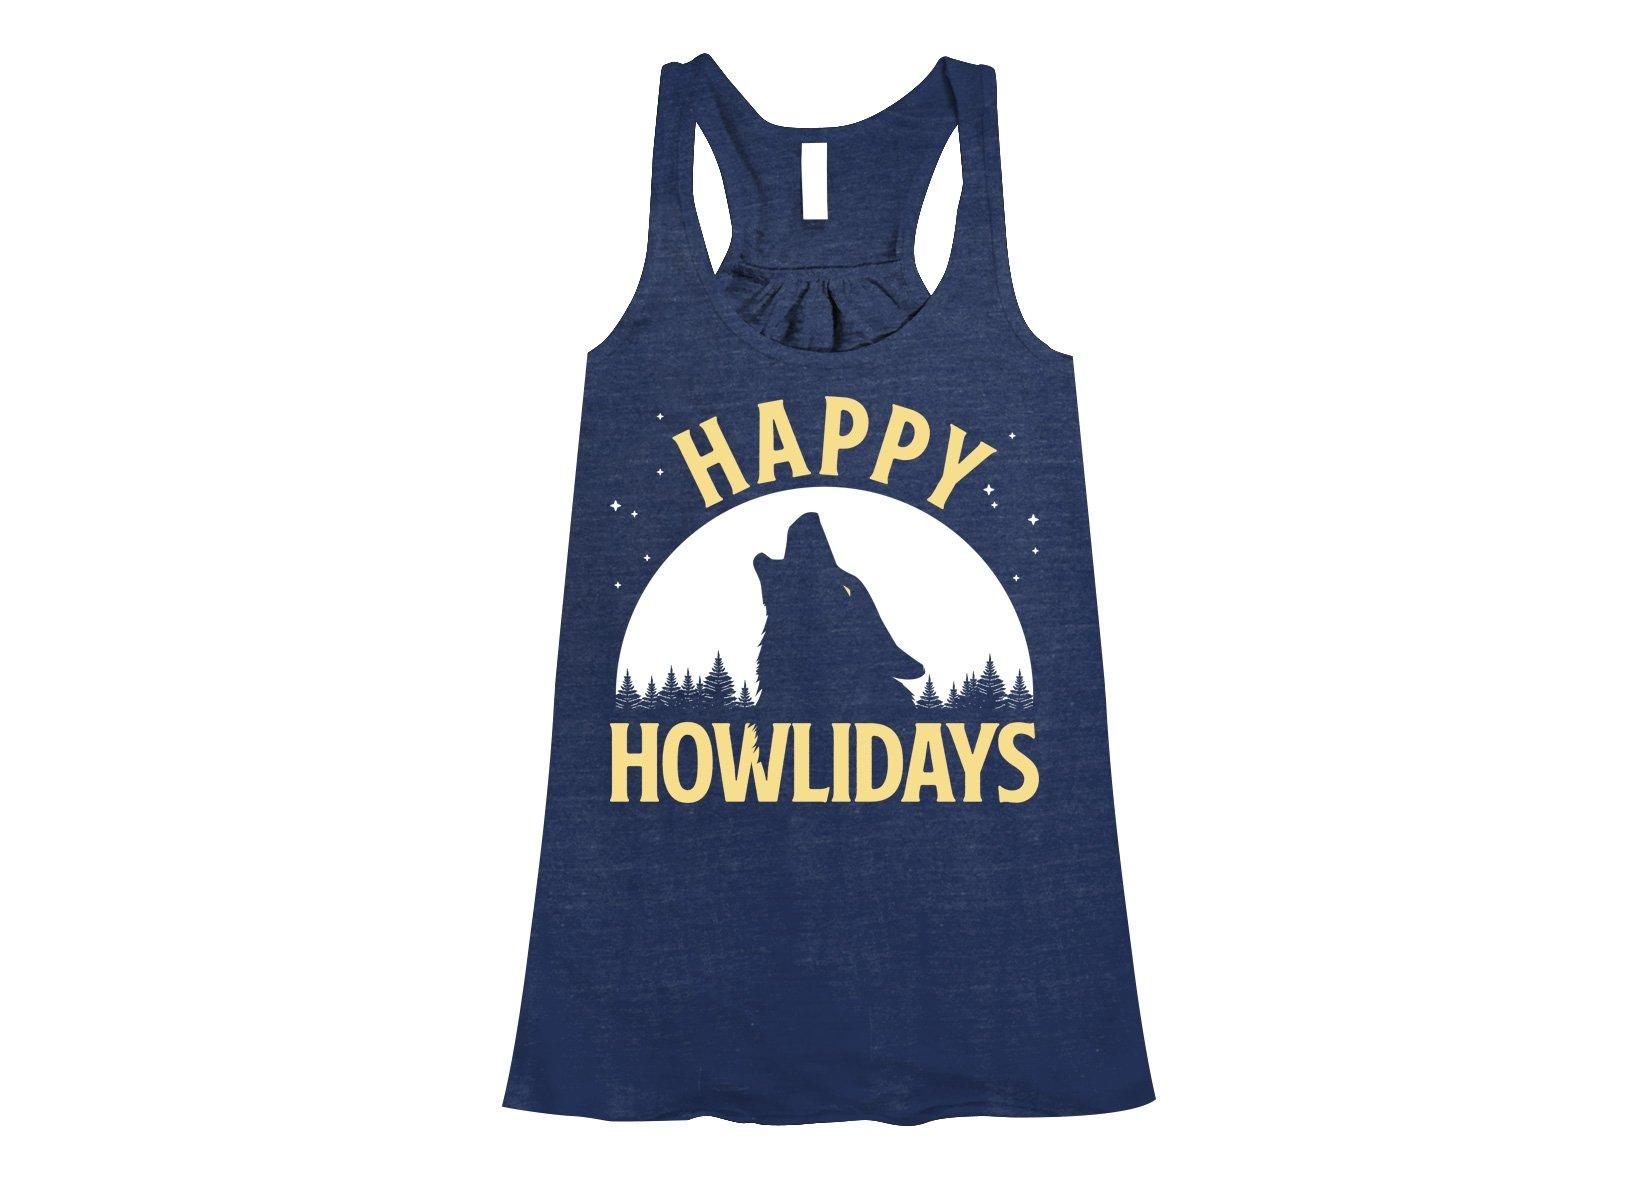 Happy Howlidays on Womens Tanks T-Shirt